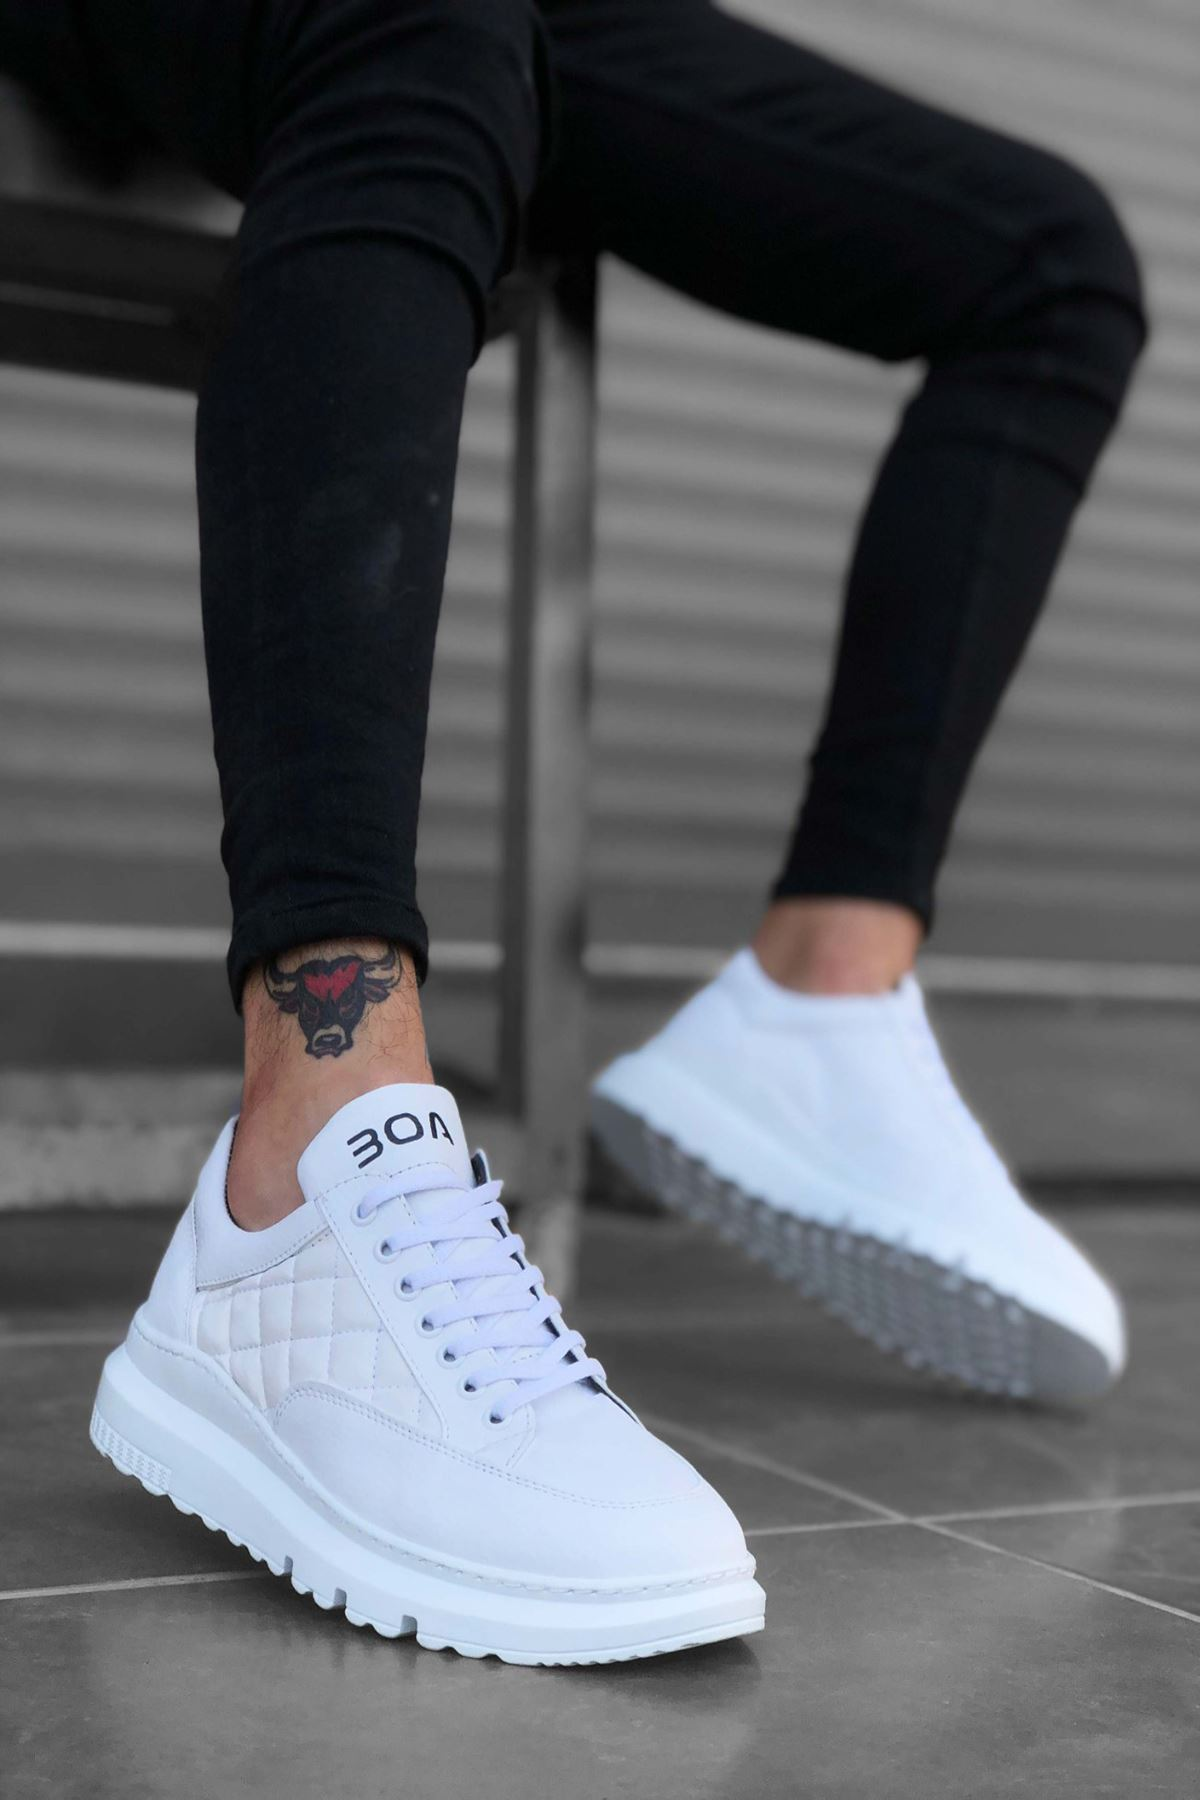 B180 Beyaz BT Bağcıklı Erkek Sneakers